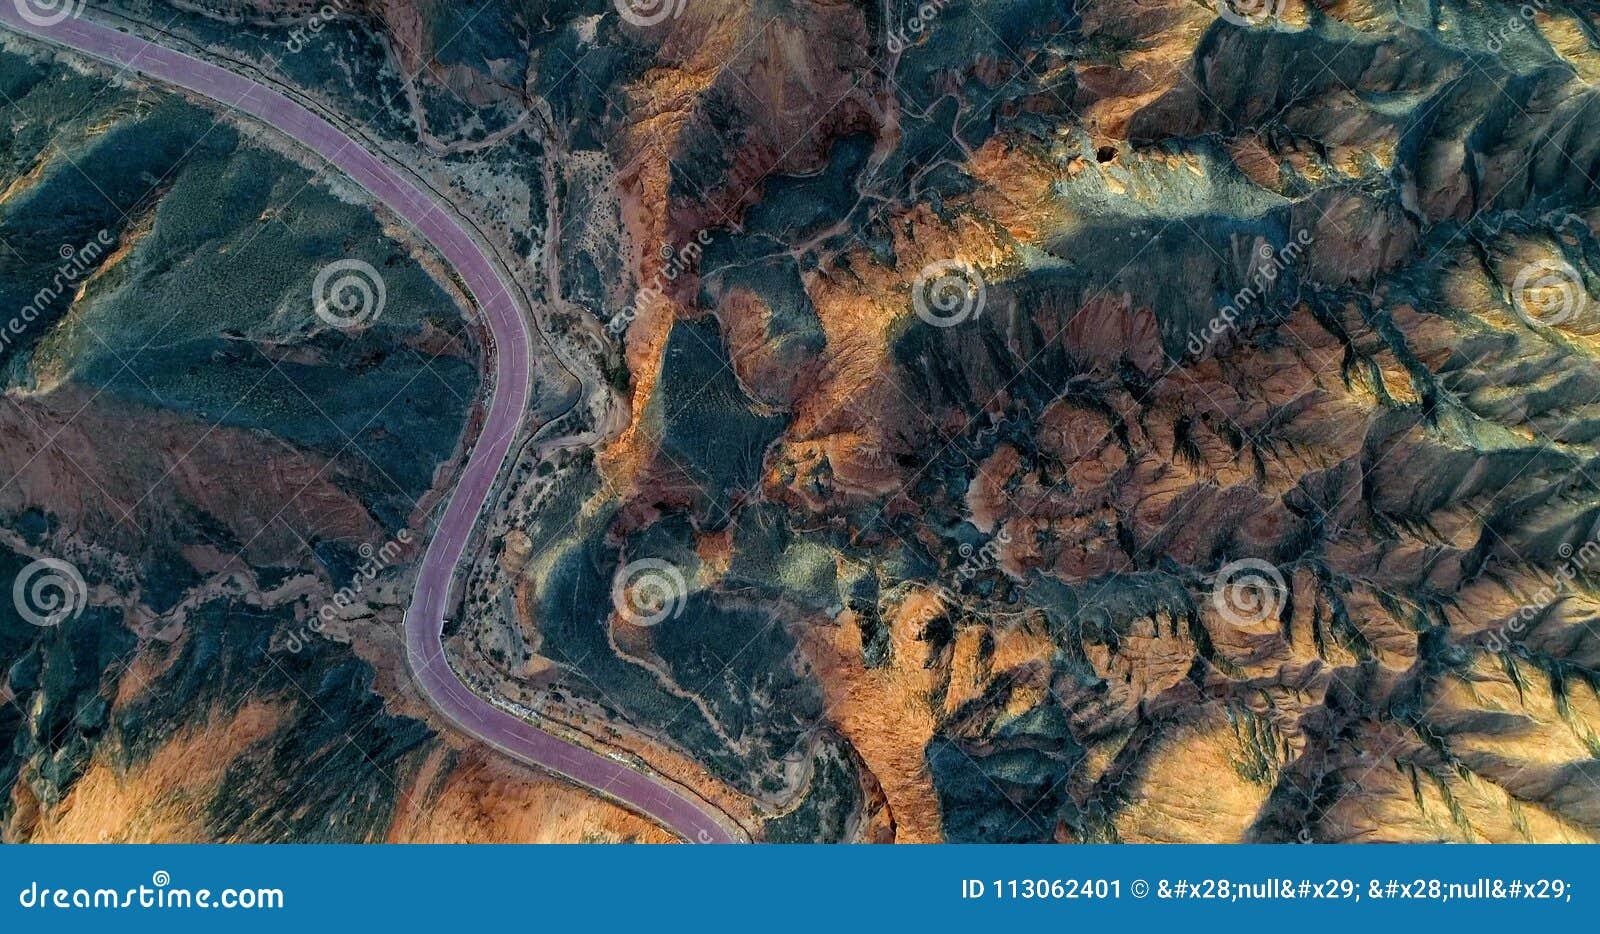 Curved road passing through a unique mountain landscape